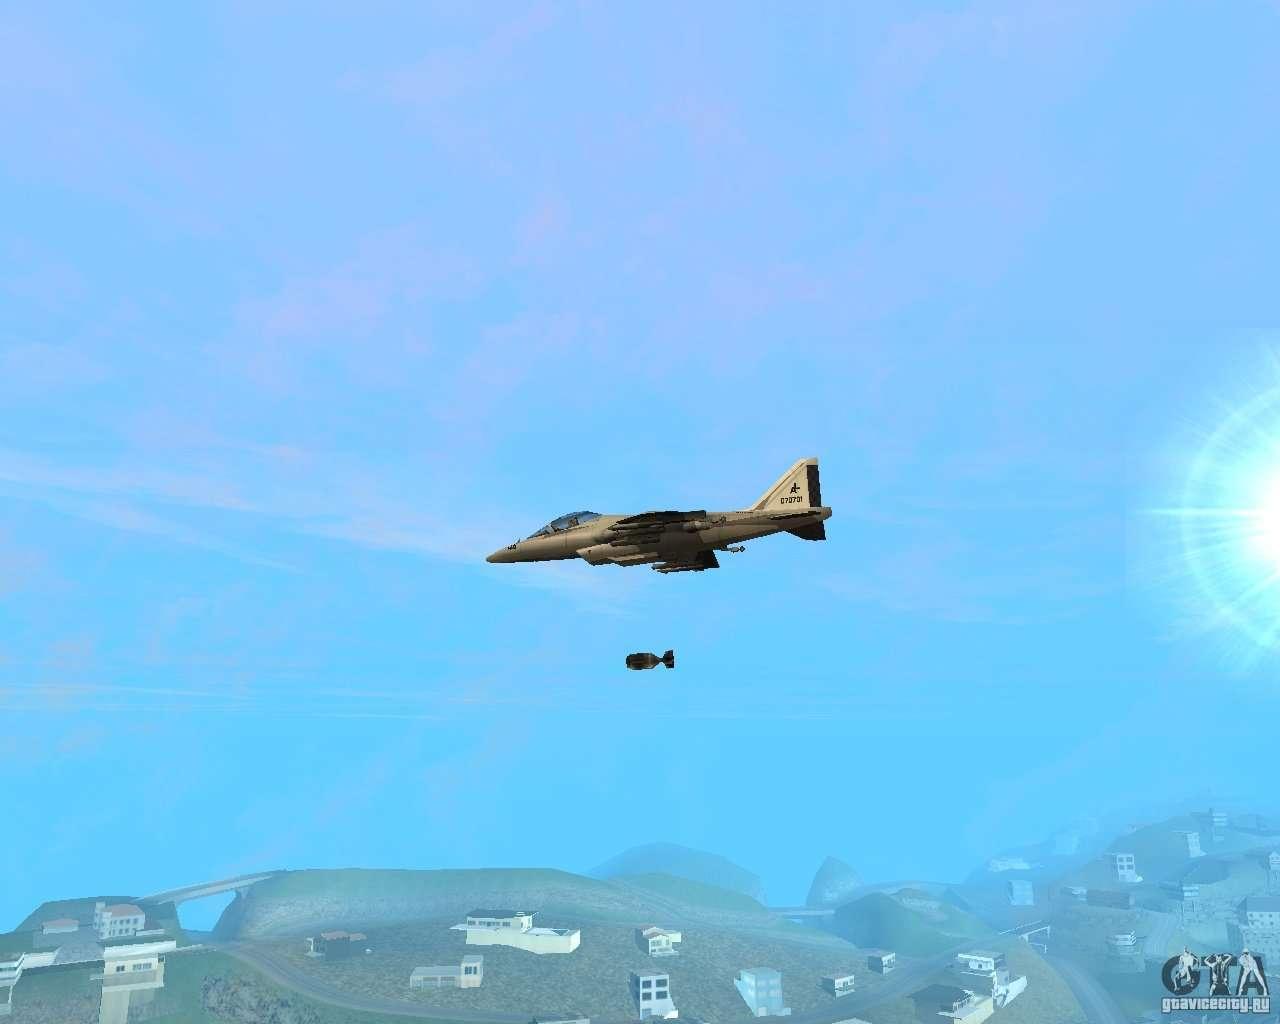 GTA: San Andreas Leaked - Slashdot